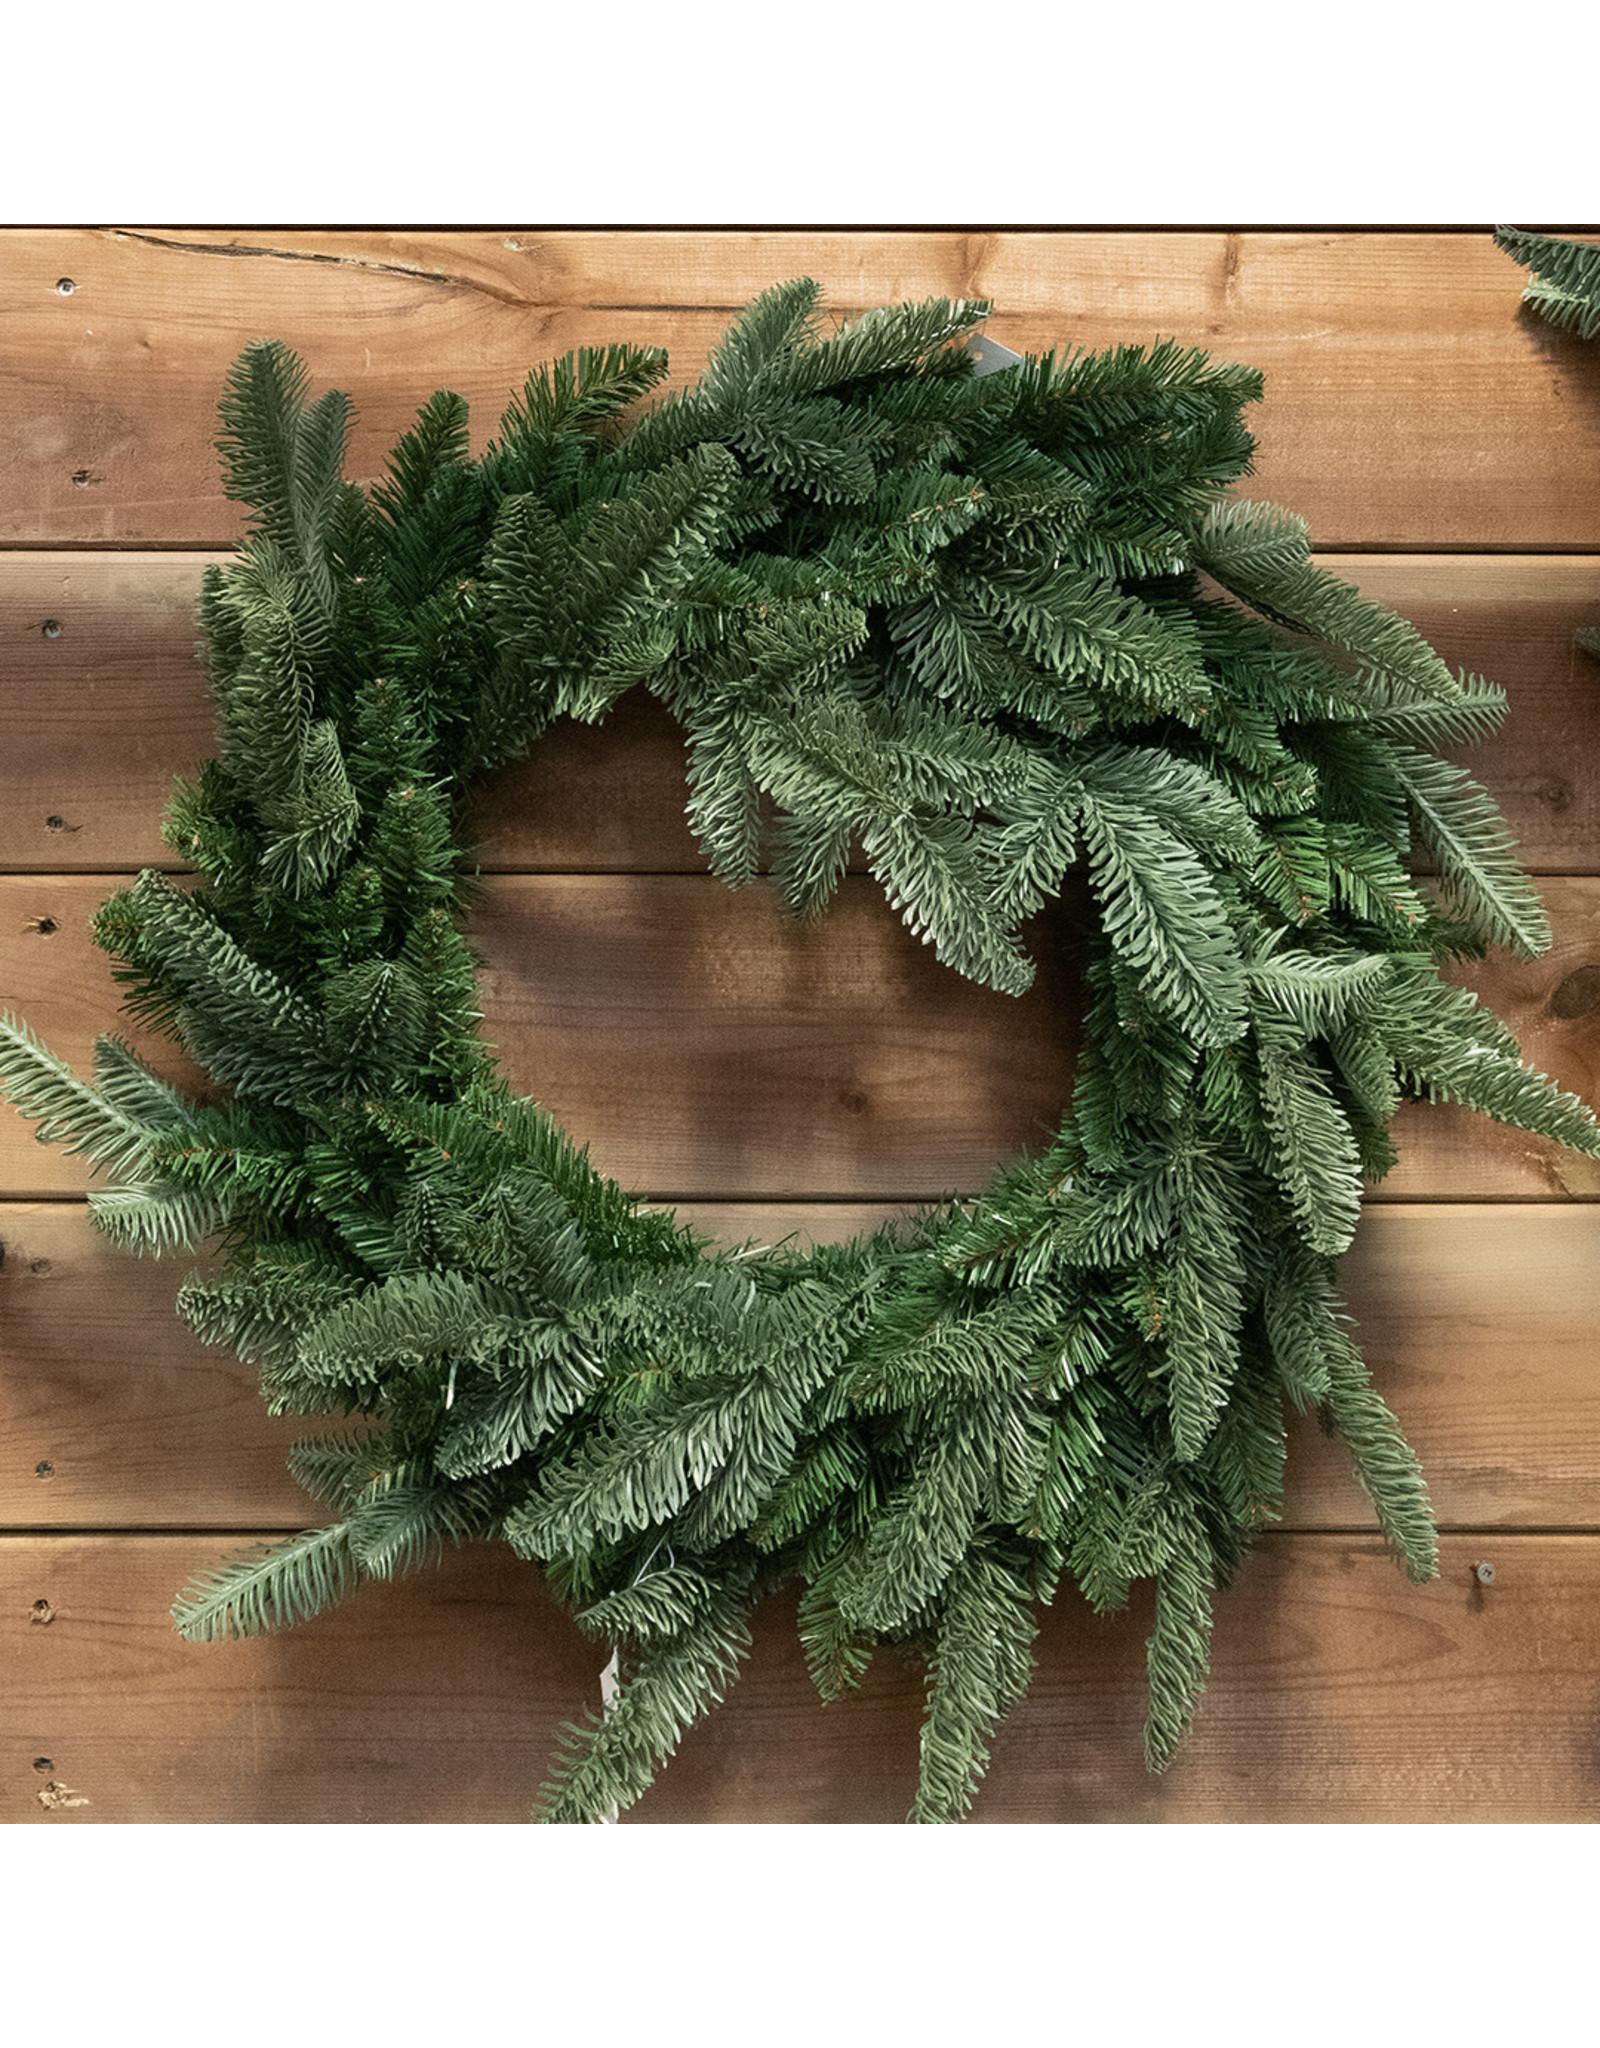 Abies Nordmann Abies Nordmann - Wreath